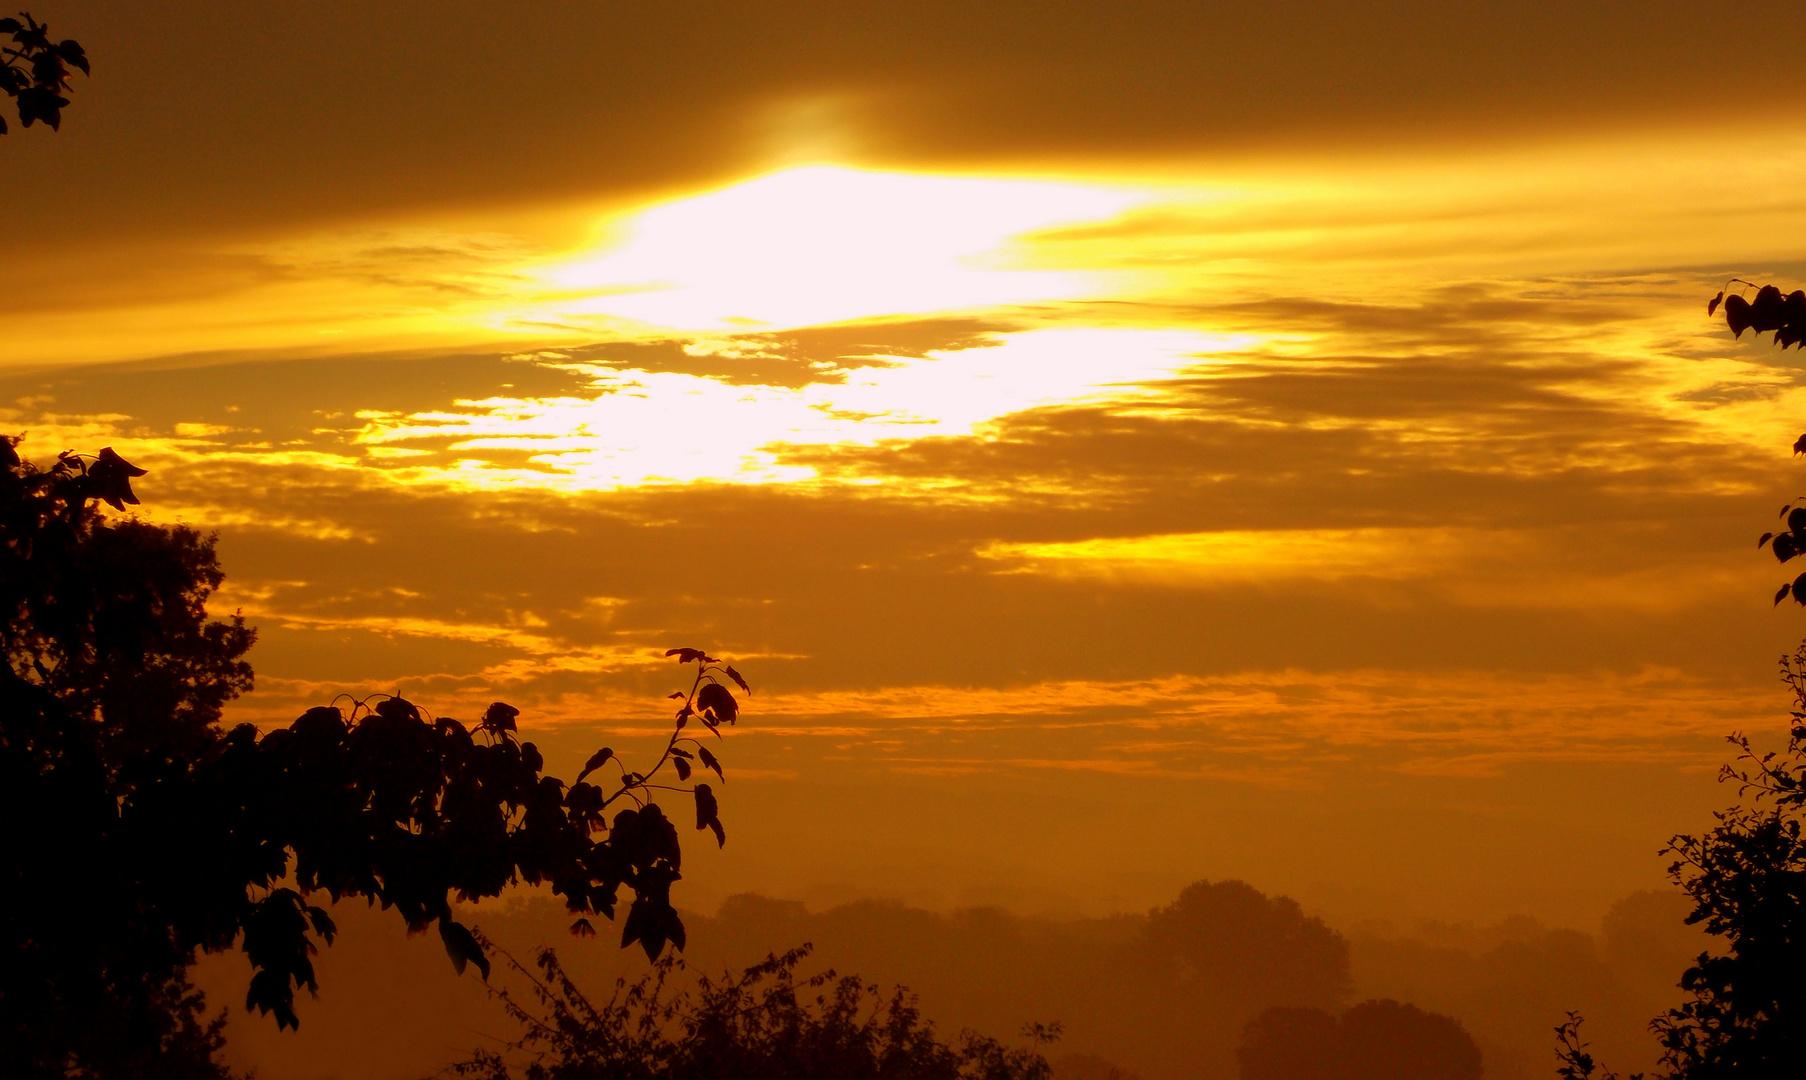 Sonnenaufgang im goldenen Oktober